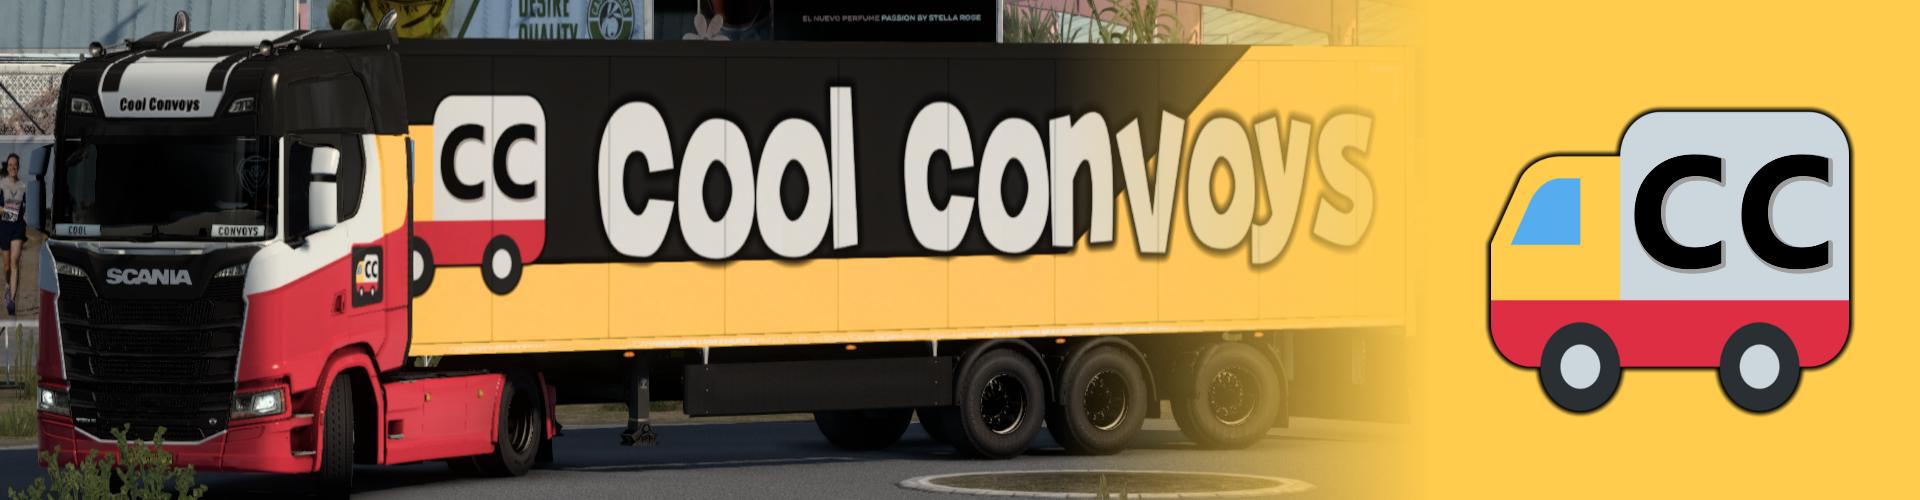 Cool Convoy #29